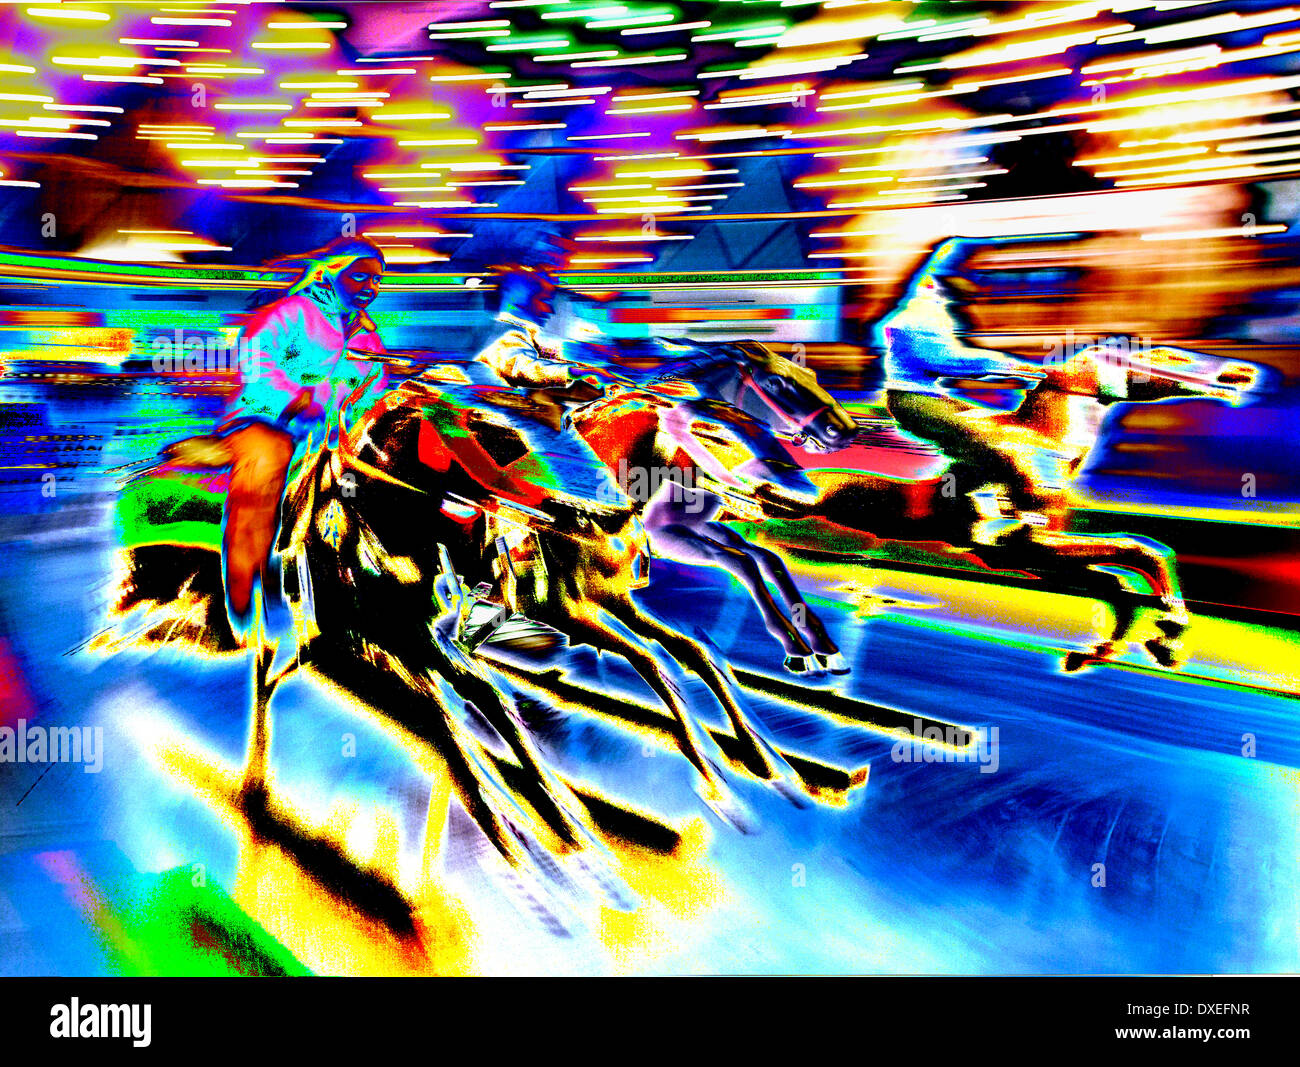 Abstract photo art of motion taken at fairground. - Stock Image